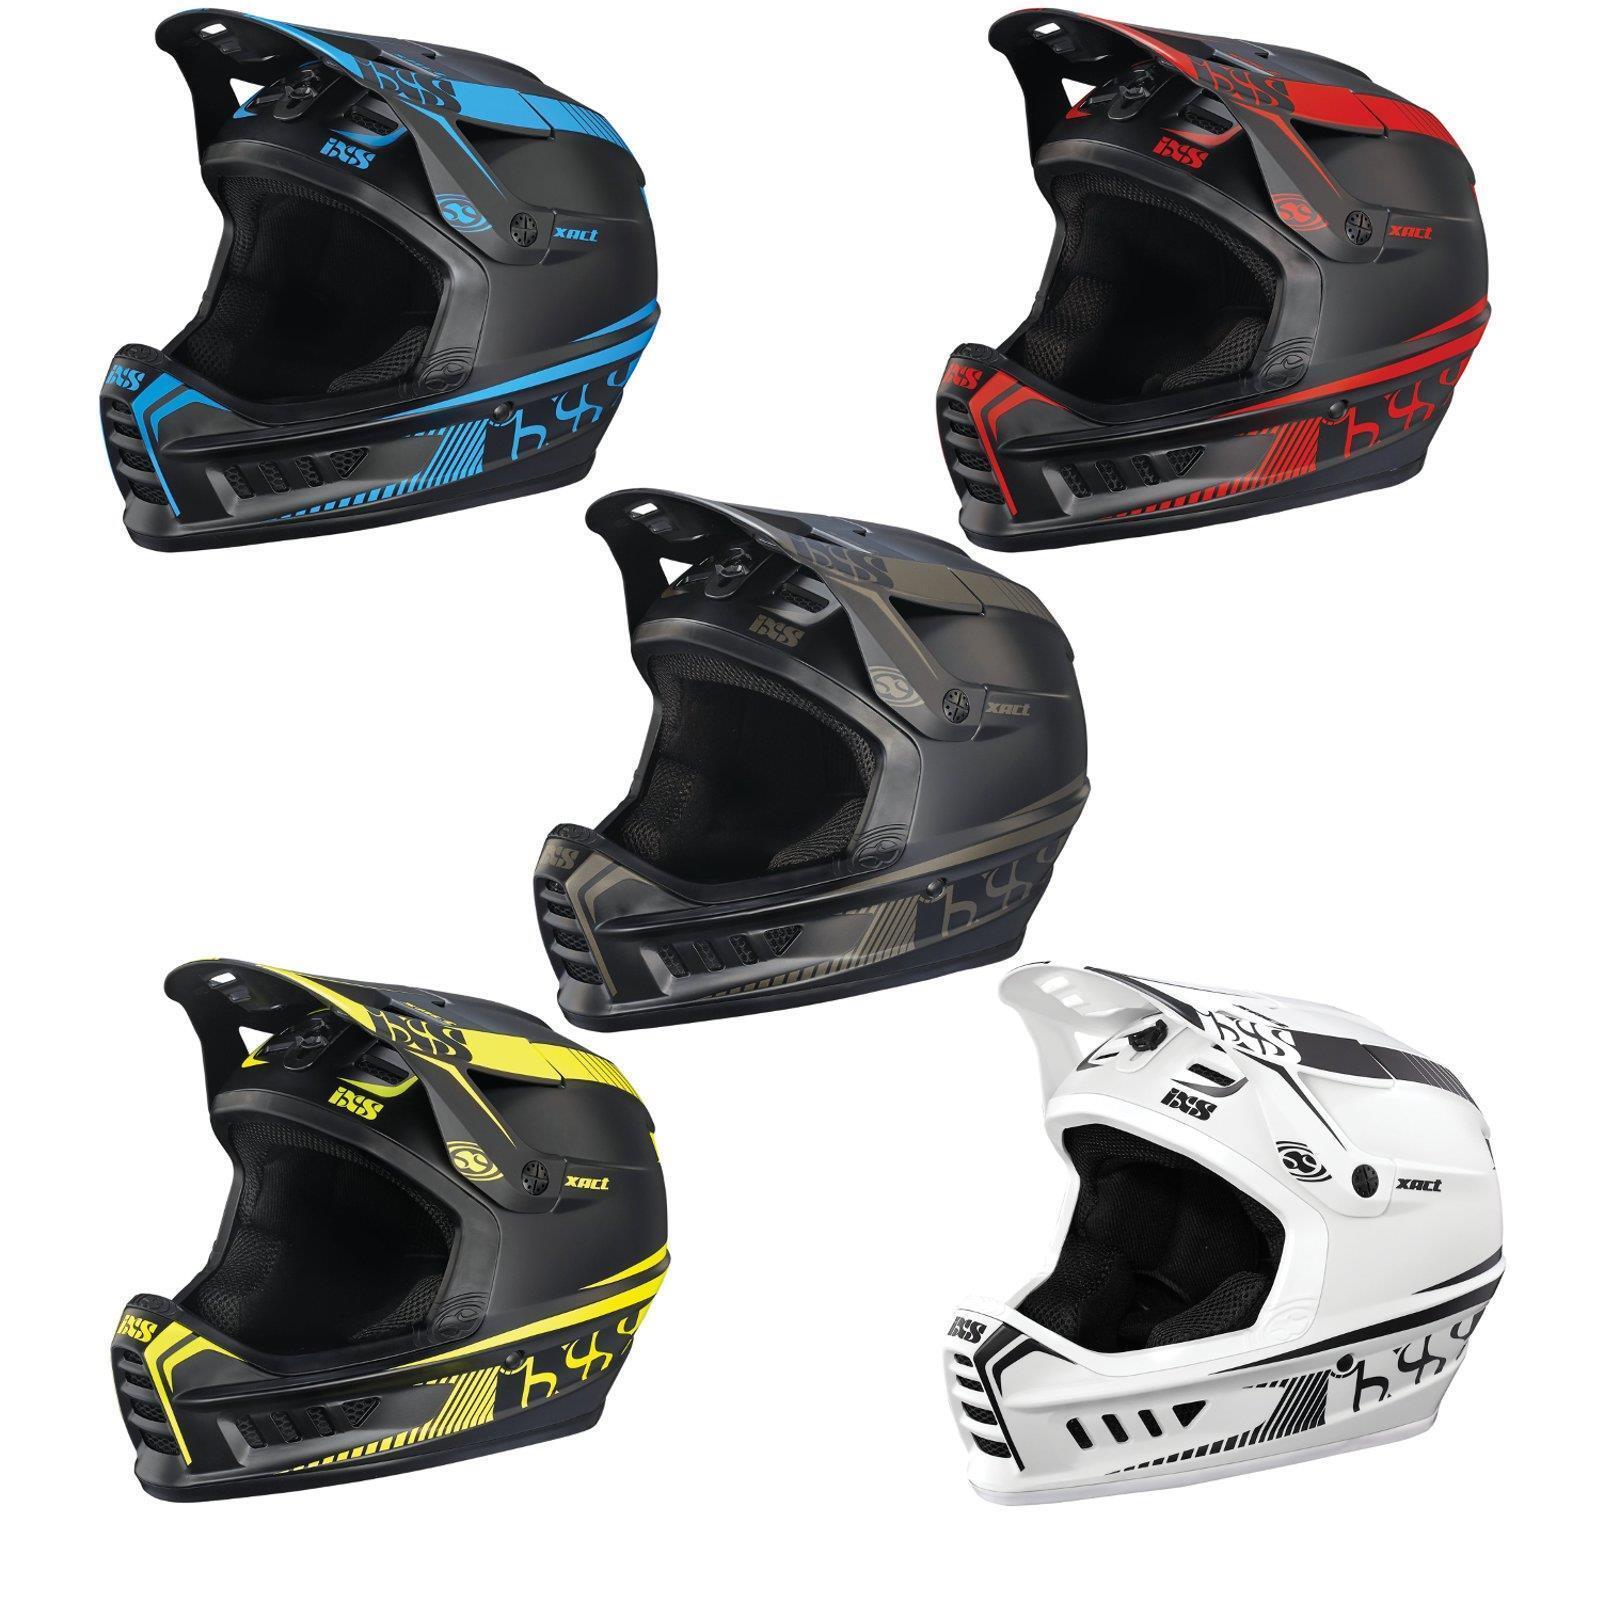 IXS Full Face casco Xact Downhill Mountain Bike DH MTB BMX ENDURO FR BICICLETTA EPR